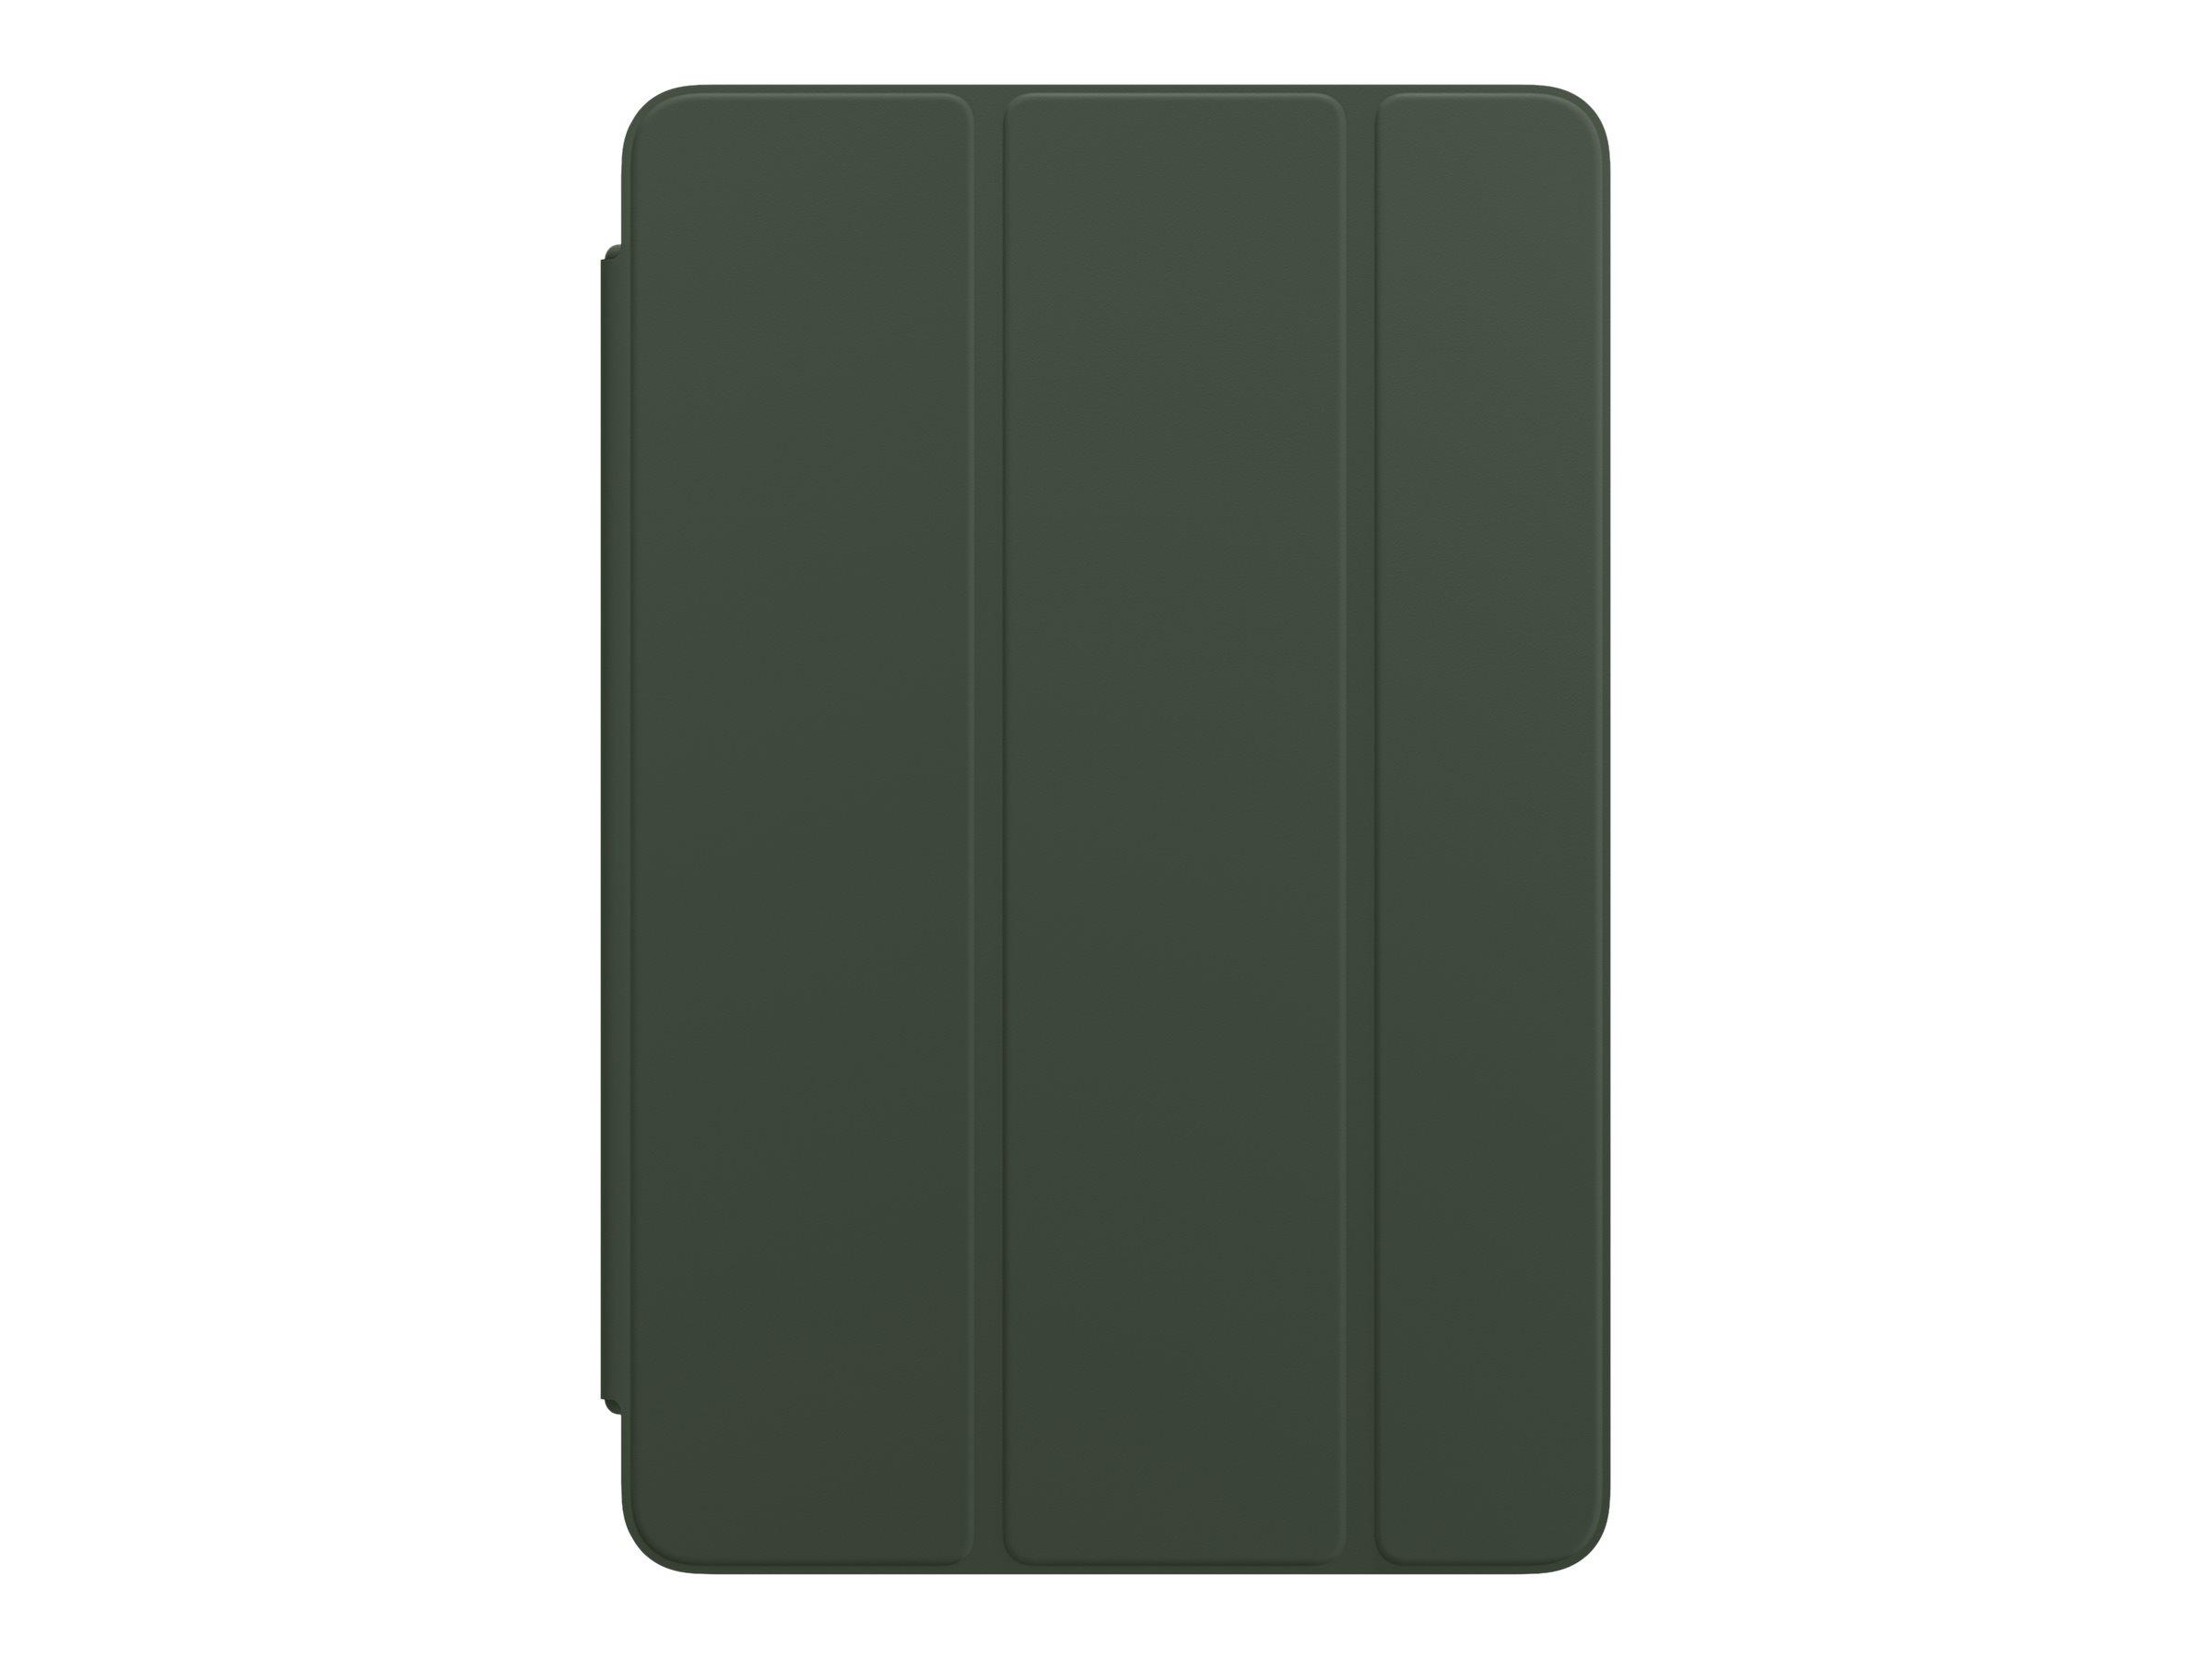 Smart flip huelle fuer tablet polyurethan cyprus green fuer ipad mini 4 5 14778095 mgyv3zm a